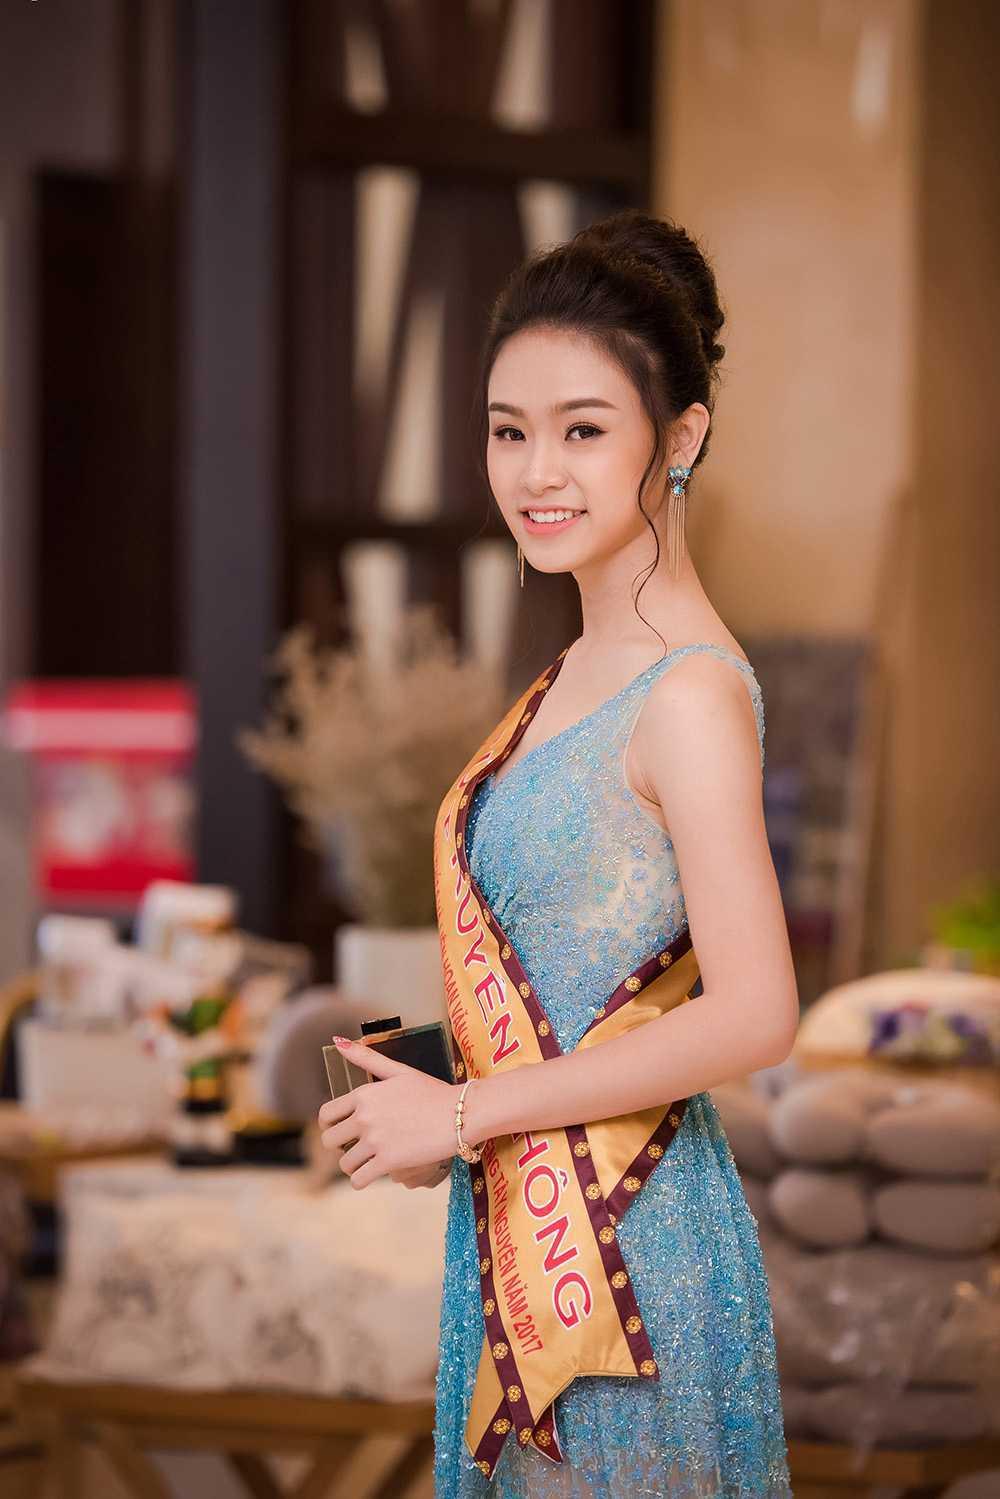 'Co gai vang' cua Hoa hau Viet Nam quyen ru o Le hoi ca phe hinh anh 3